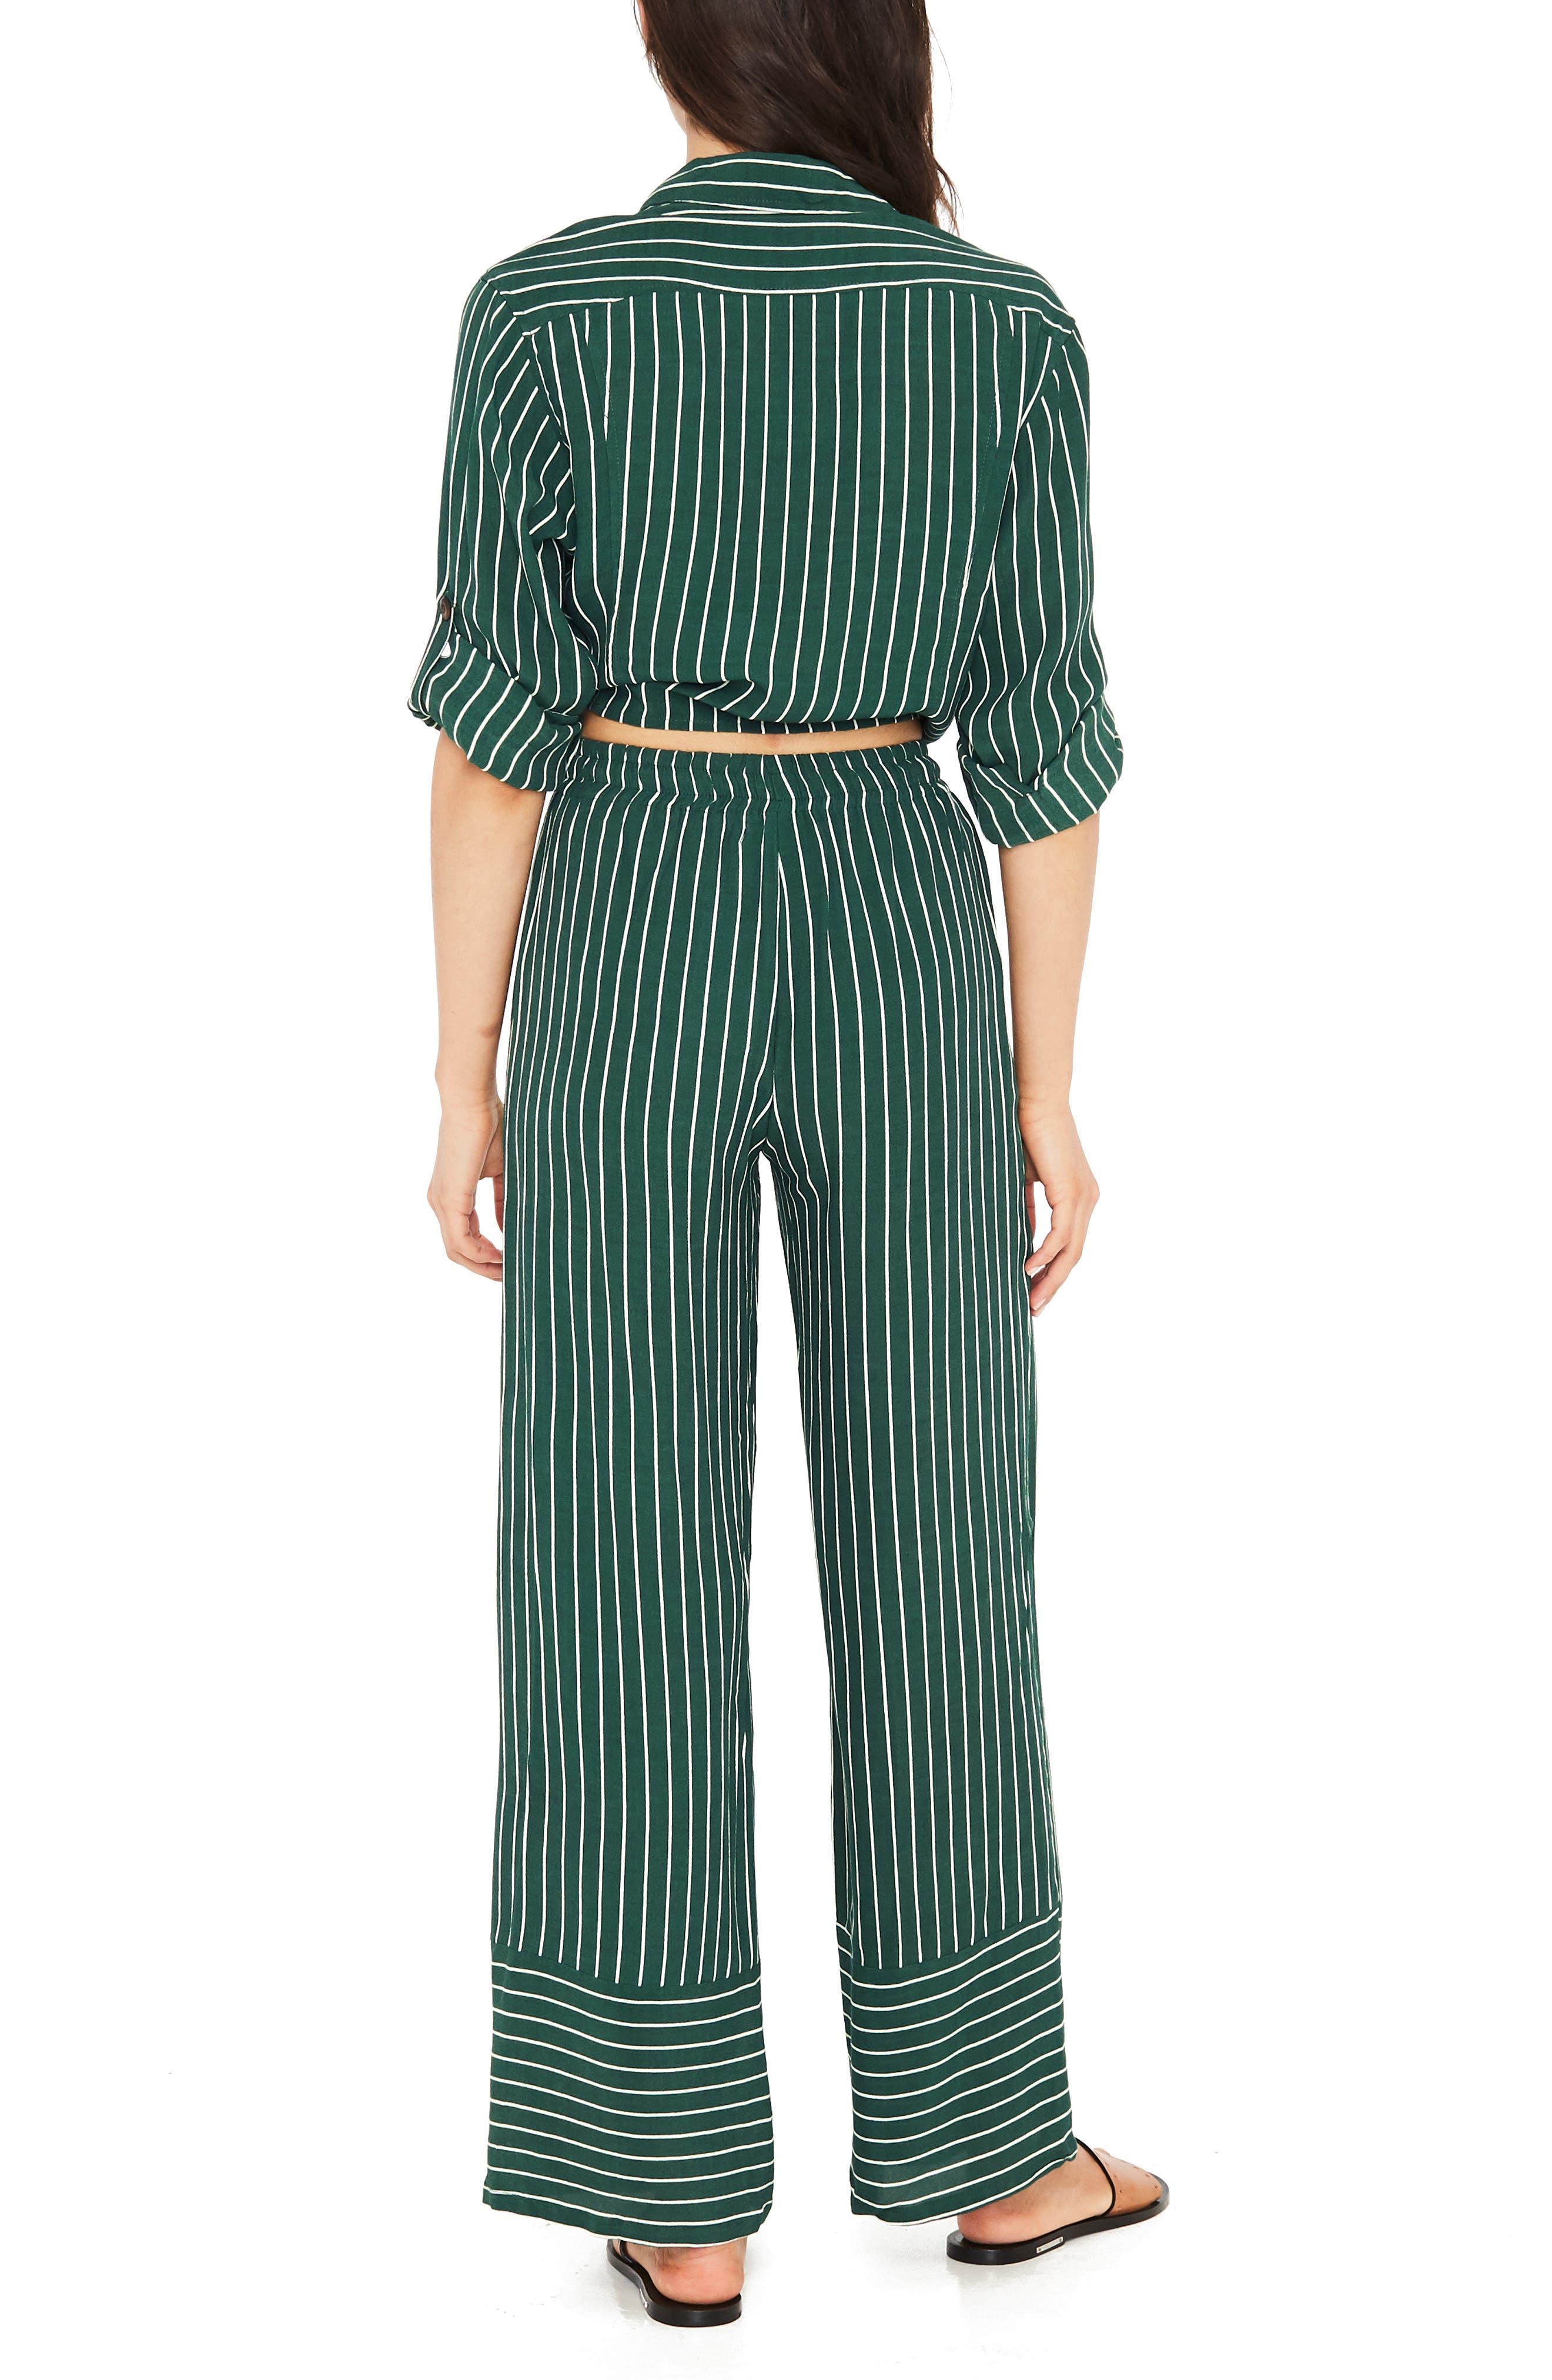 Havana High Waist Stripe Pants,                             Alternate thumbnail 3, color,                             PASEO STRIPE